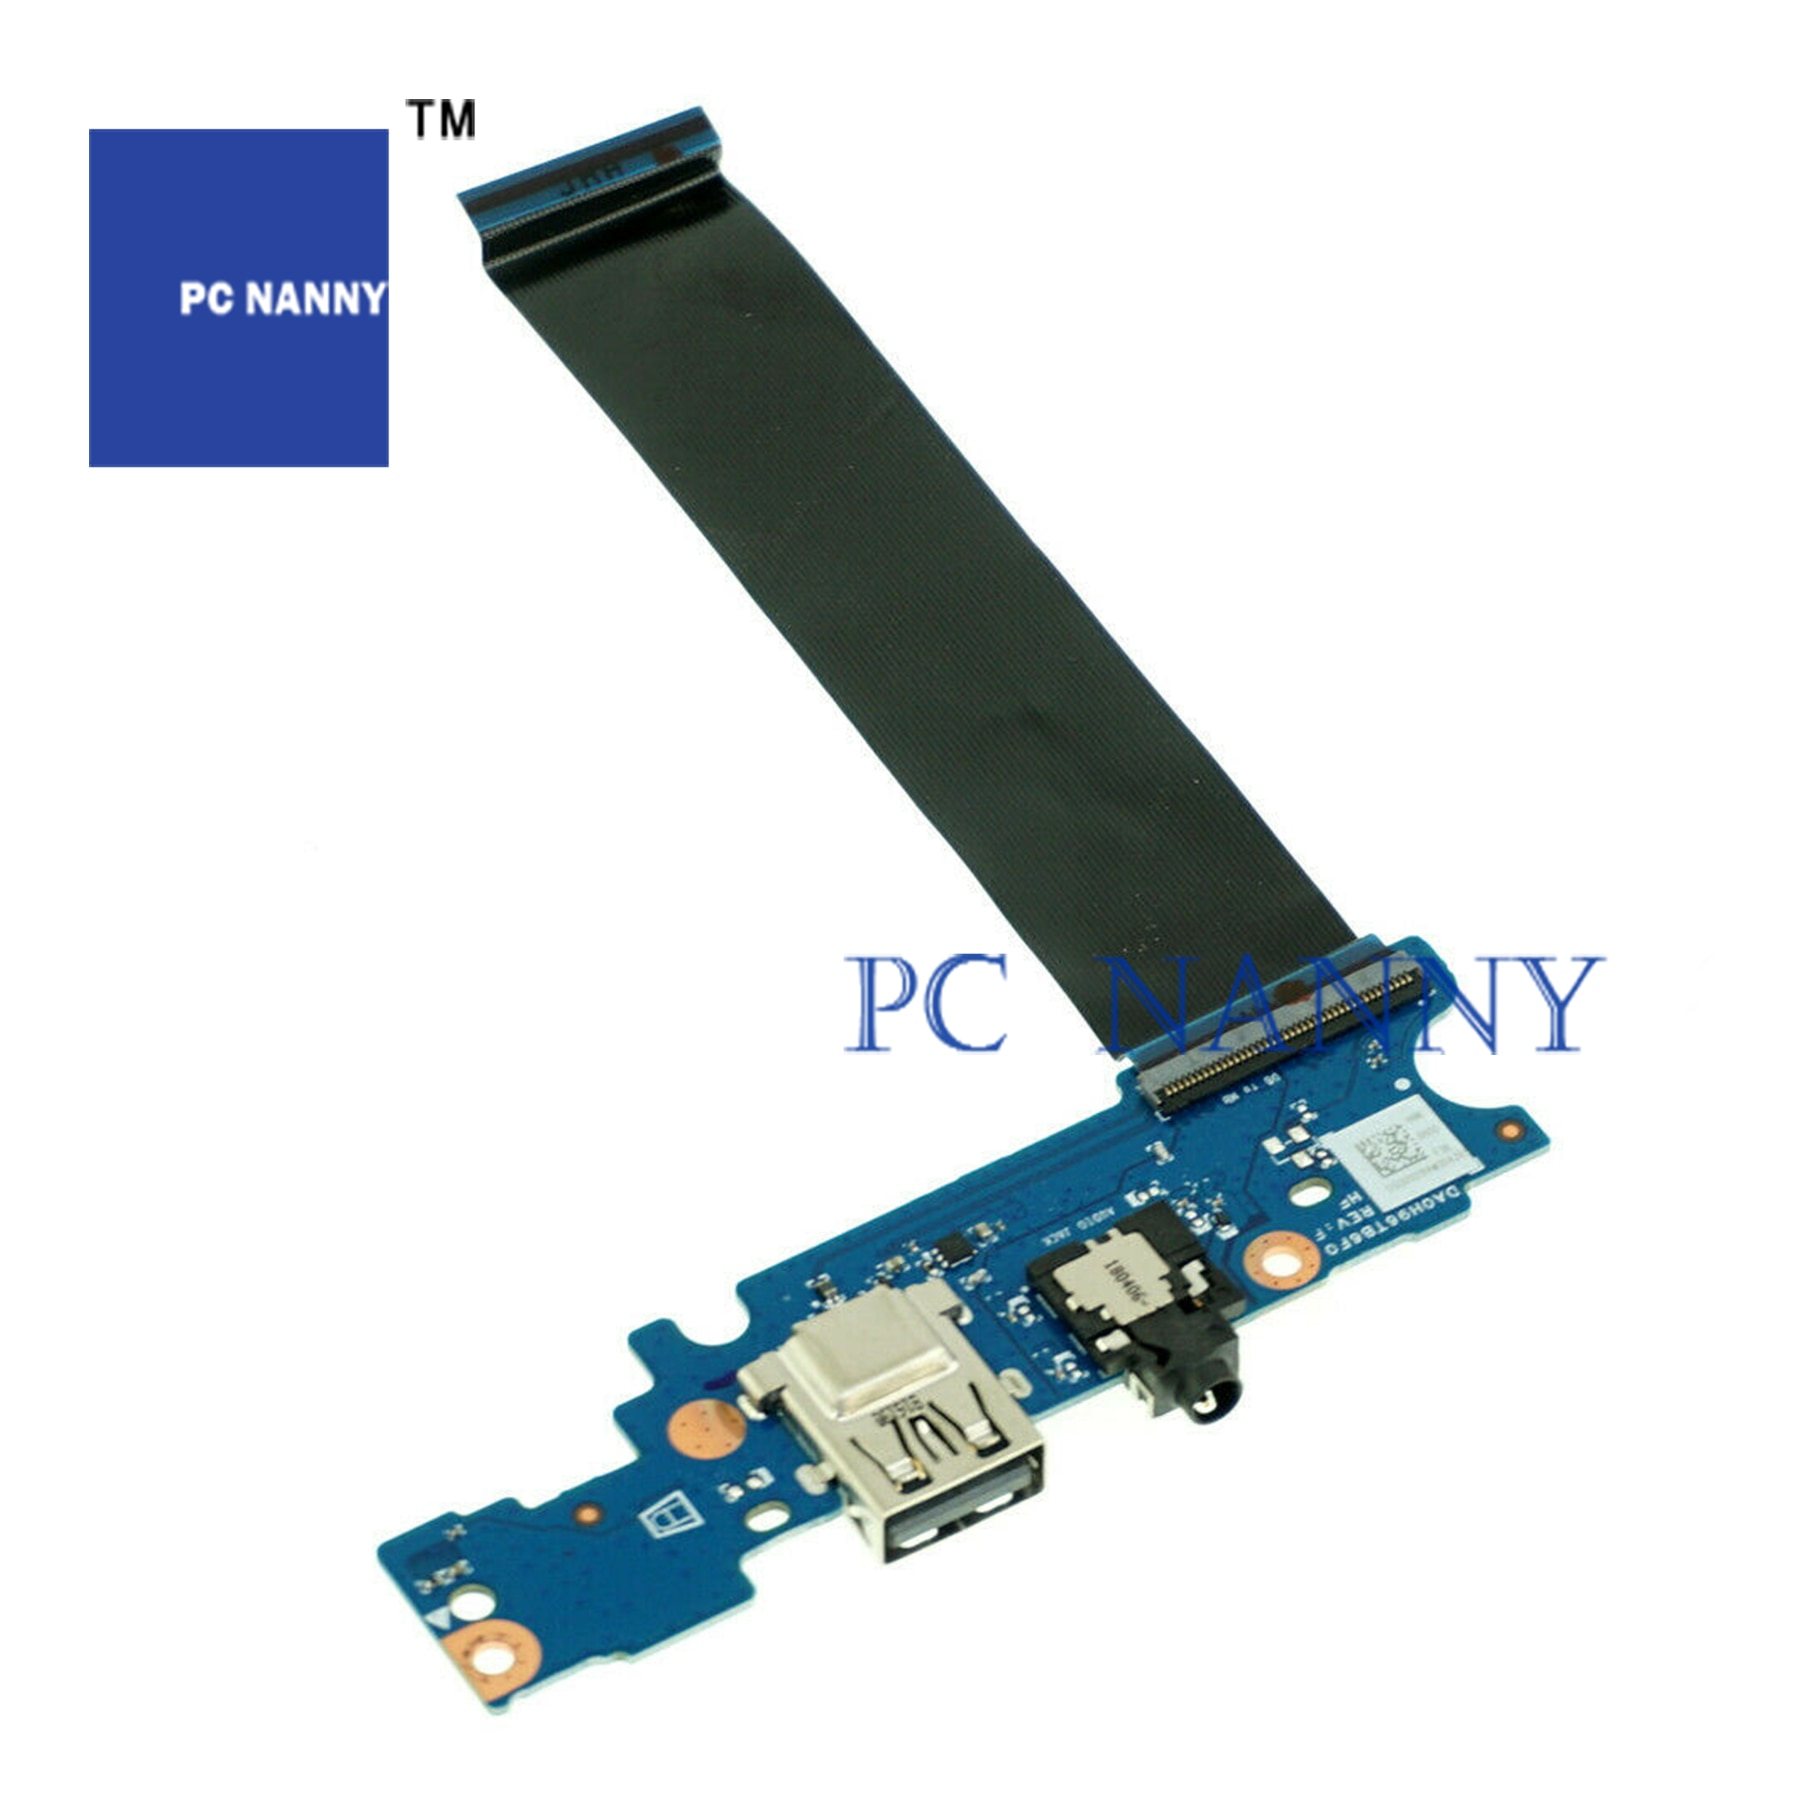 PCNANNY ل Matebook VLT-W60 USB الصوت مجلس مع كابل DA0H96TB6F0 DAH96ATB6A0